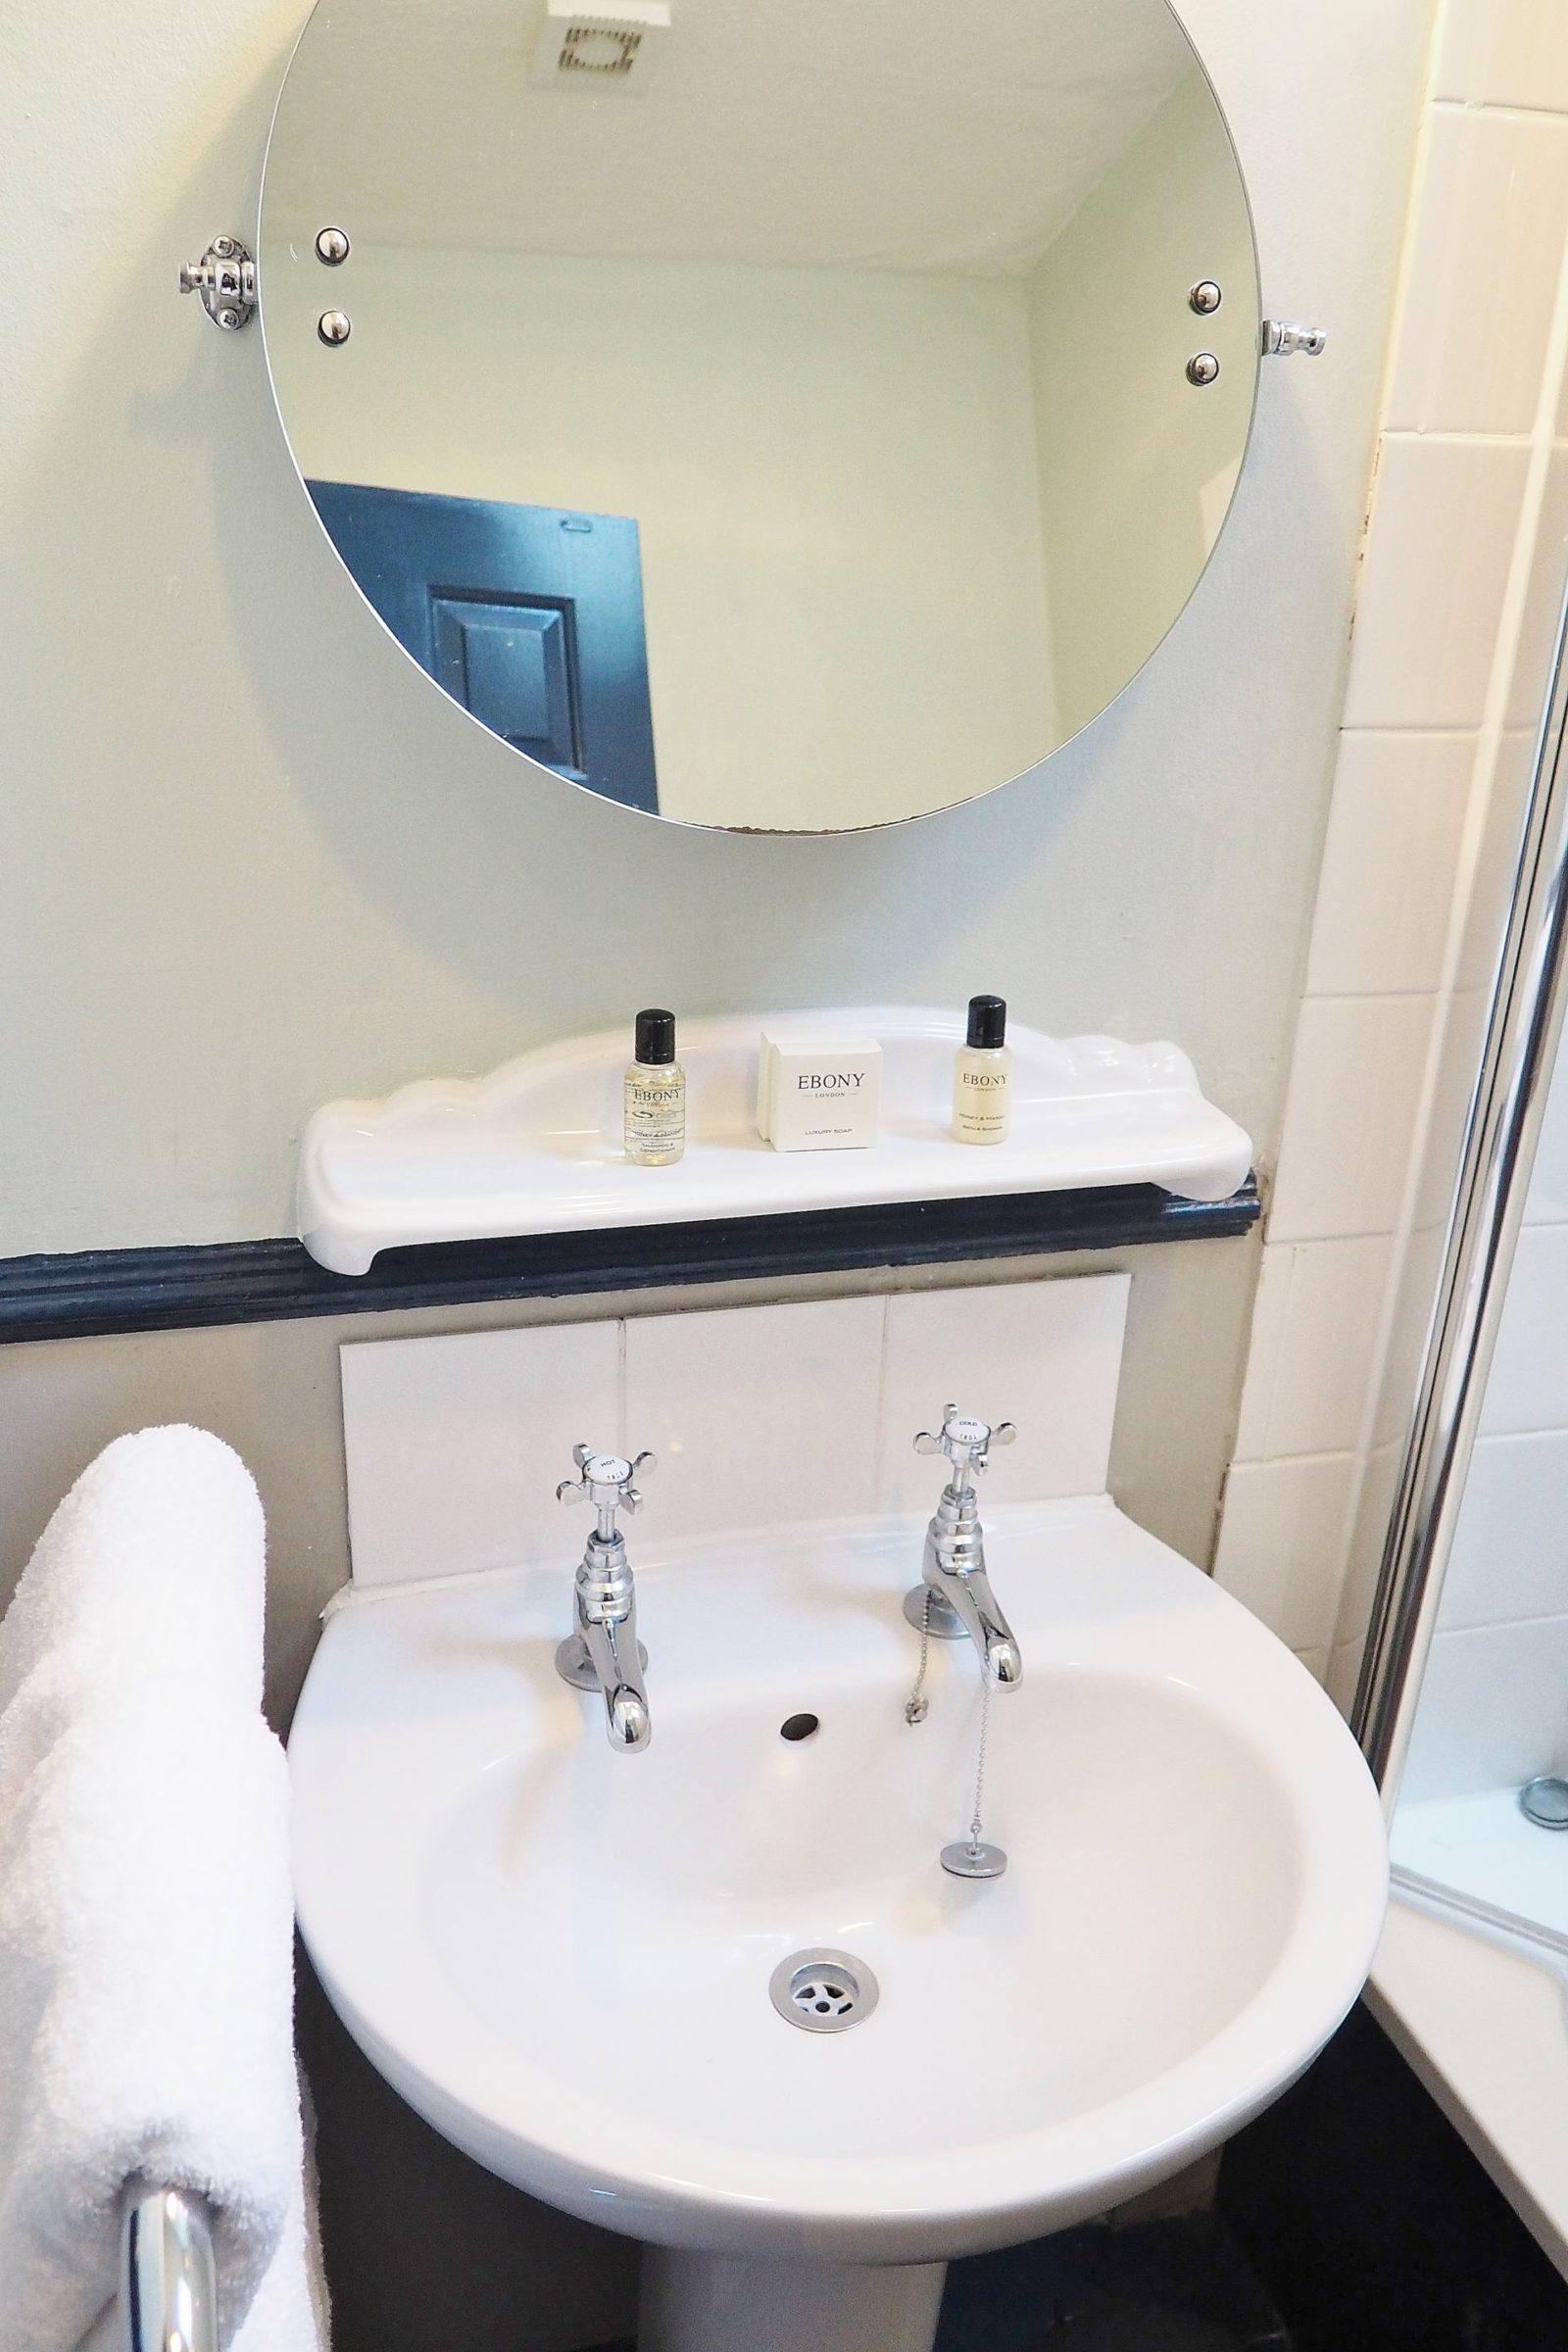 Emma Victoria Stokes The White Horse Duns Tew Bathroom Sink